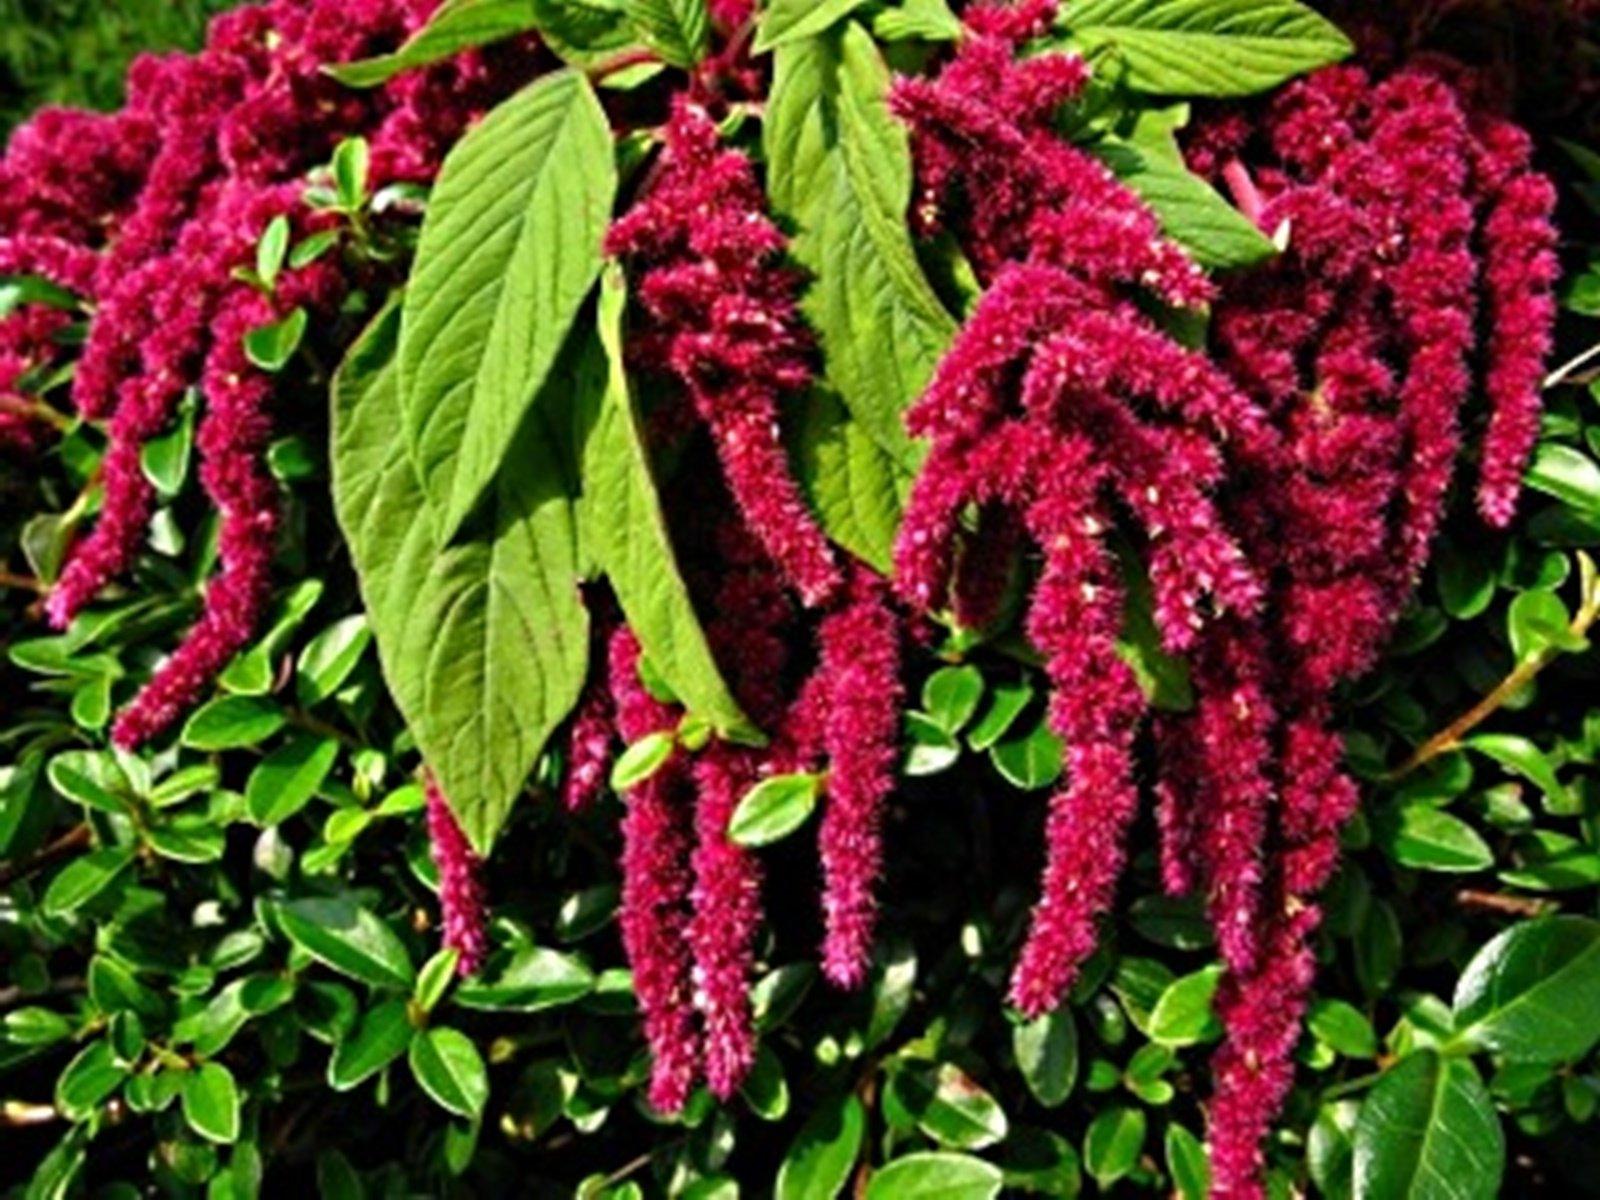 Амарант растение: правила посадки и ухода